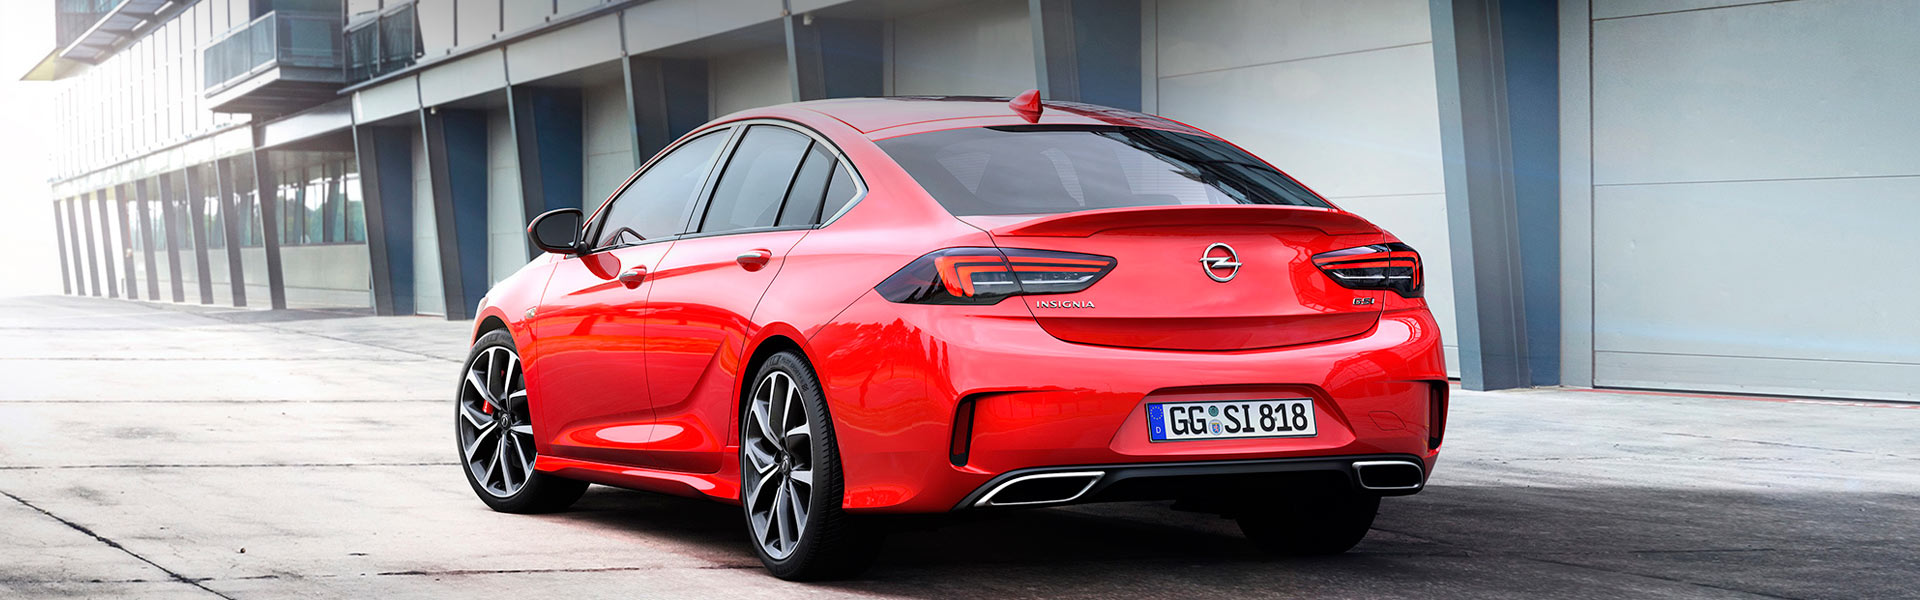 Замена стоек Opel